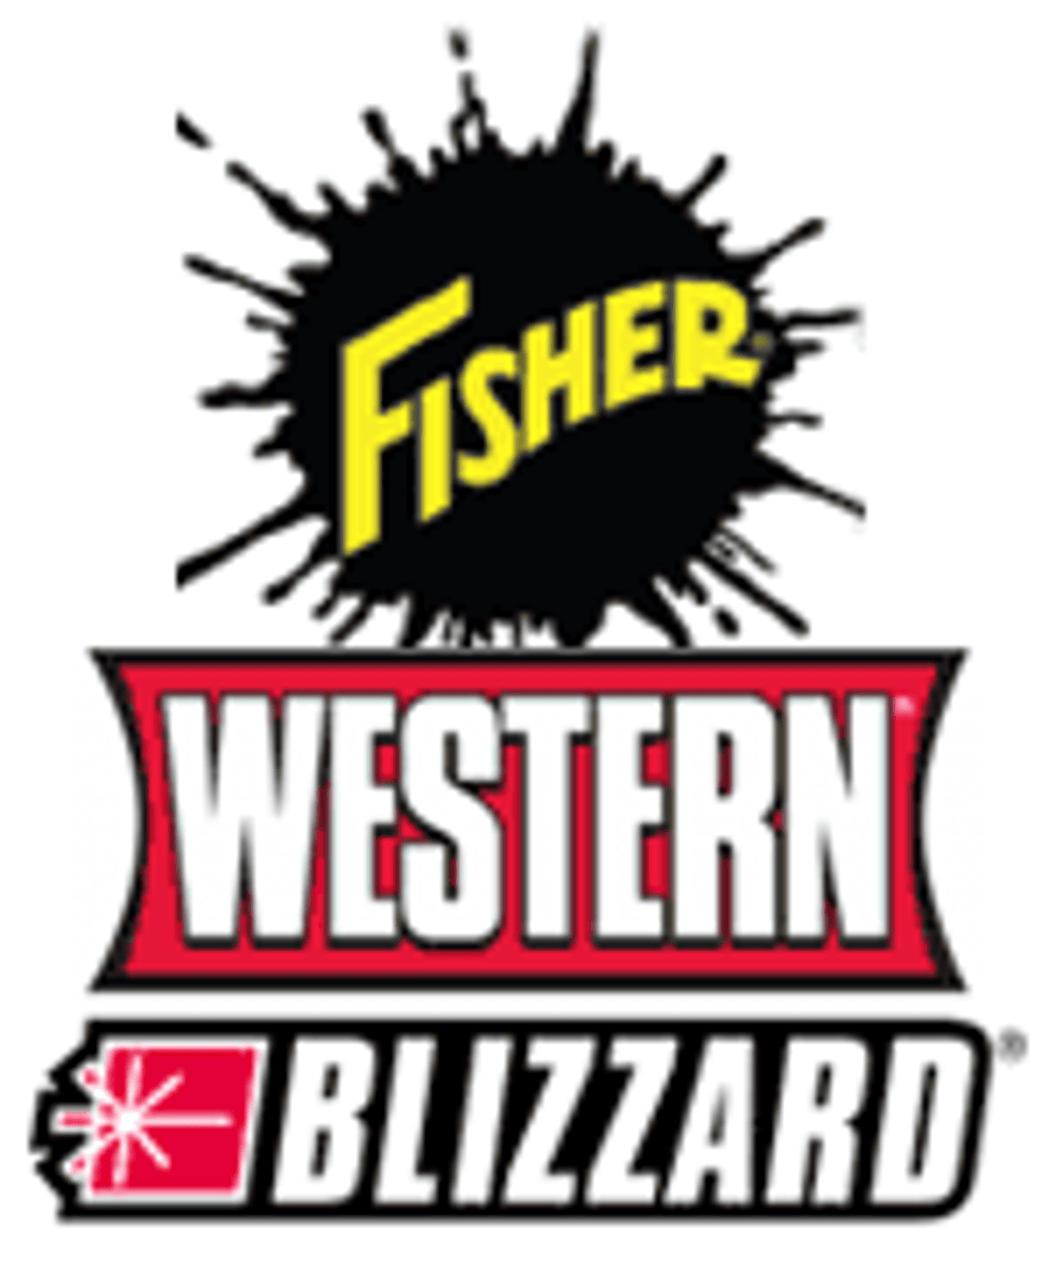 28802-1 - FISHER INTENSIFIRE -WESTERN NIGHTHAWK -BLIZZARD STORM SEEKER - SNOWEX  HEADLIGHT SERVICE KIT (PS)